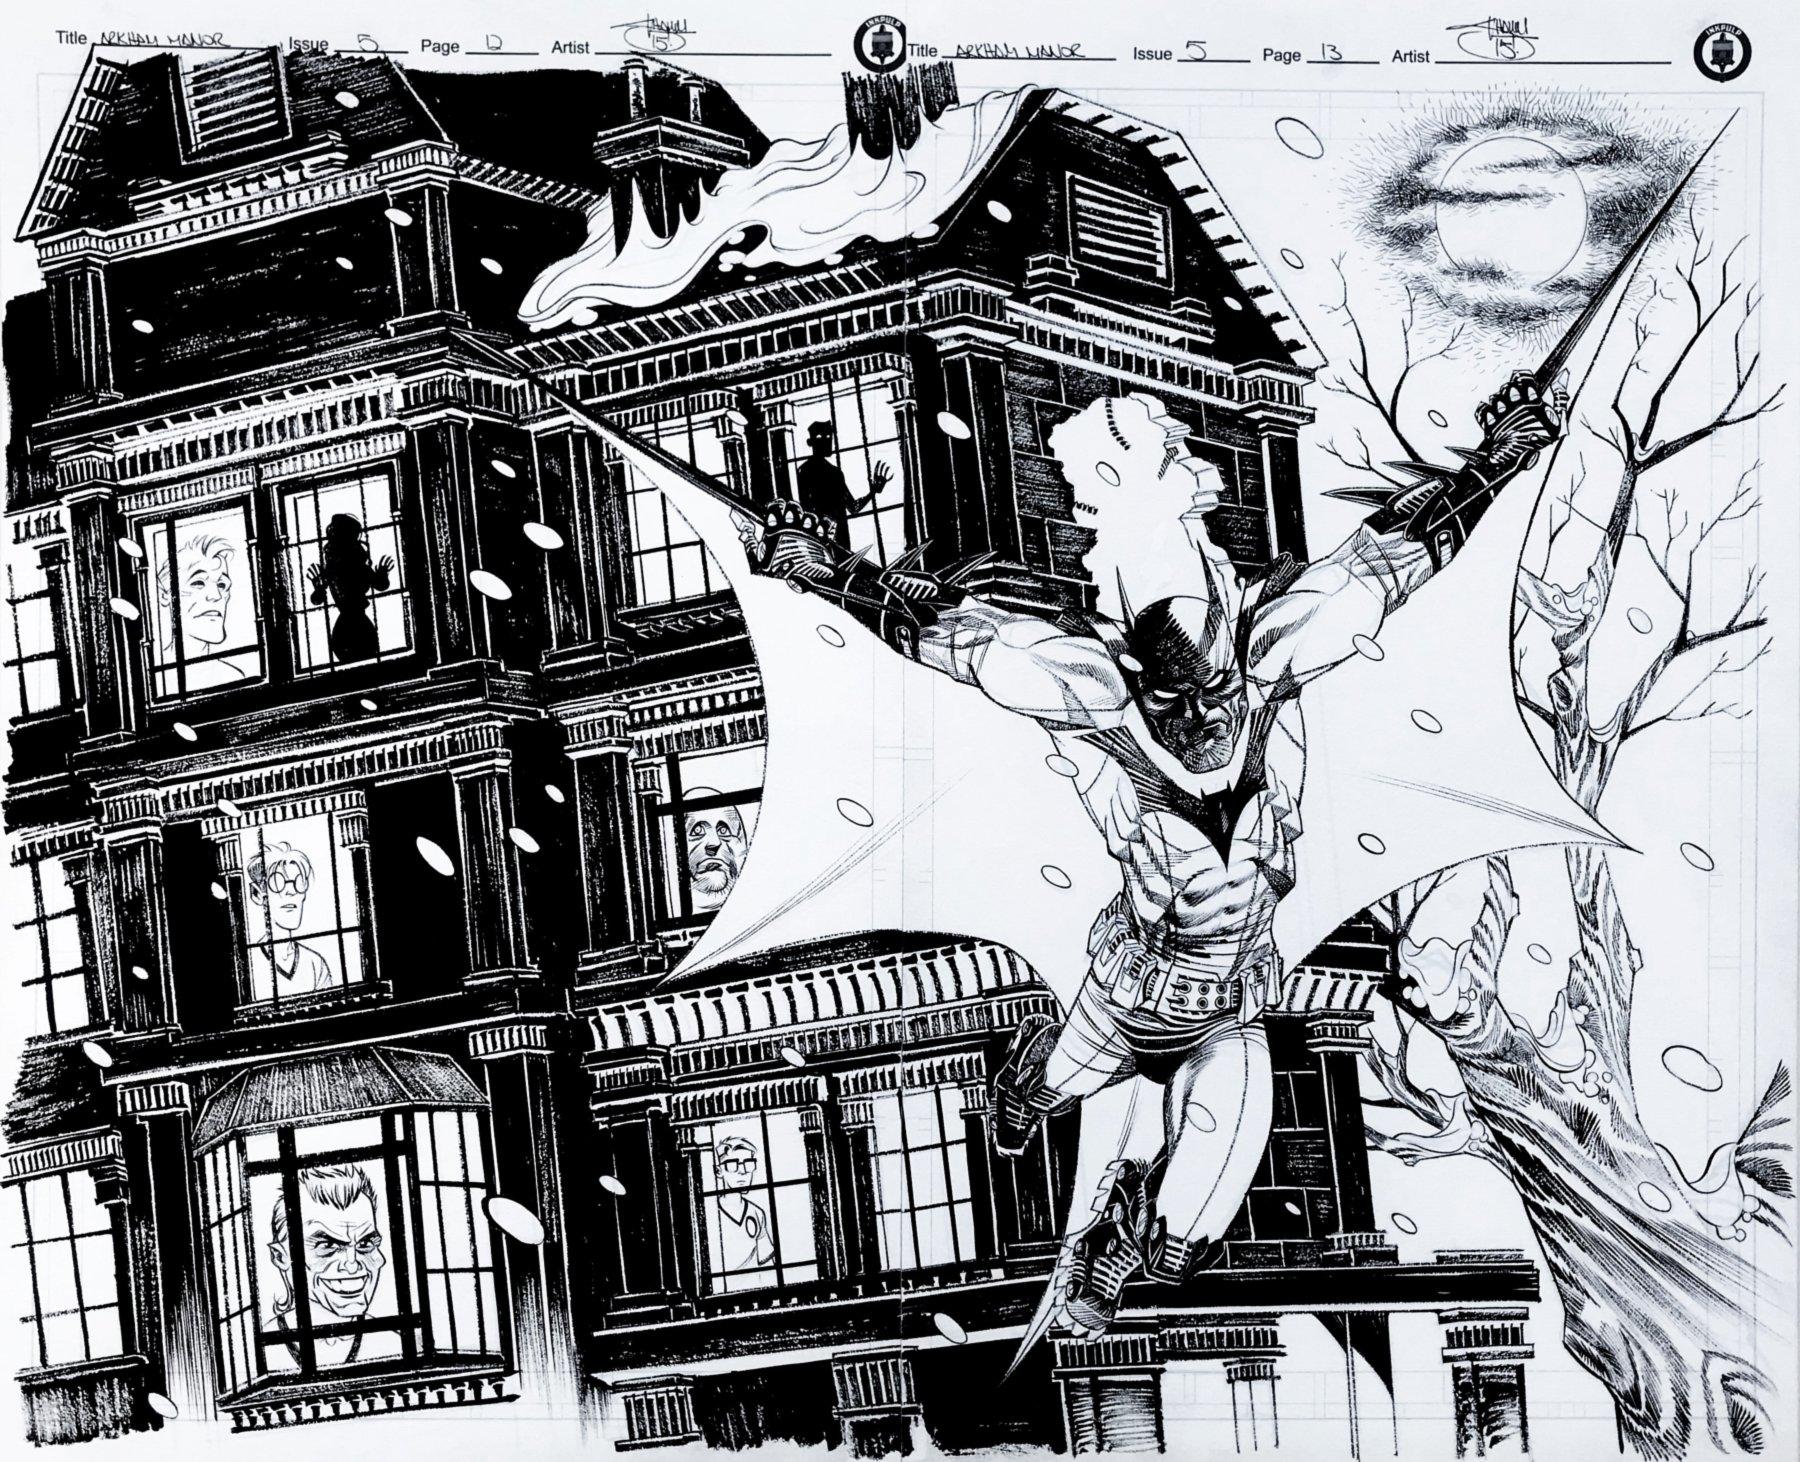 Batman Arkham Manor #5 p 12-13 DPS (HUGE BATMAN LEAPING FROM ARKHAM MANOR!) 2015